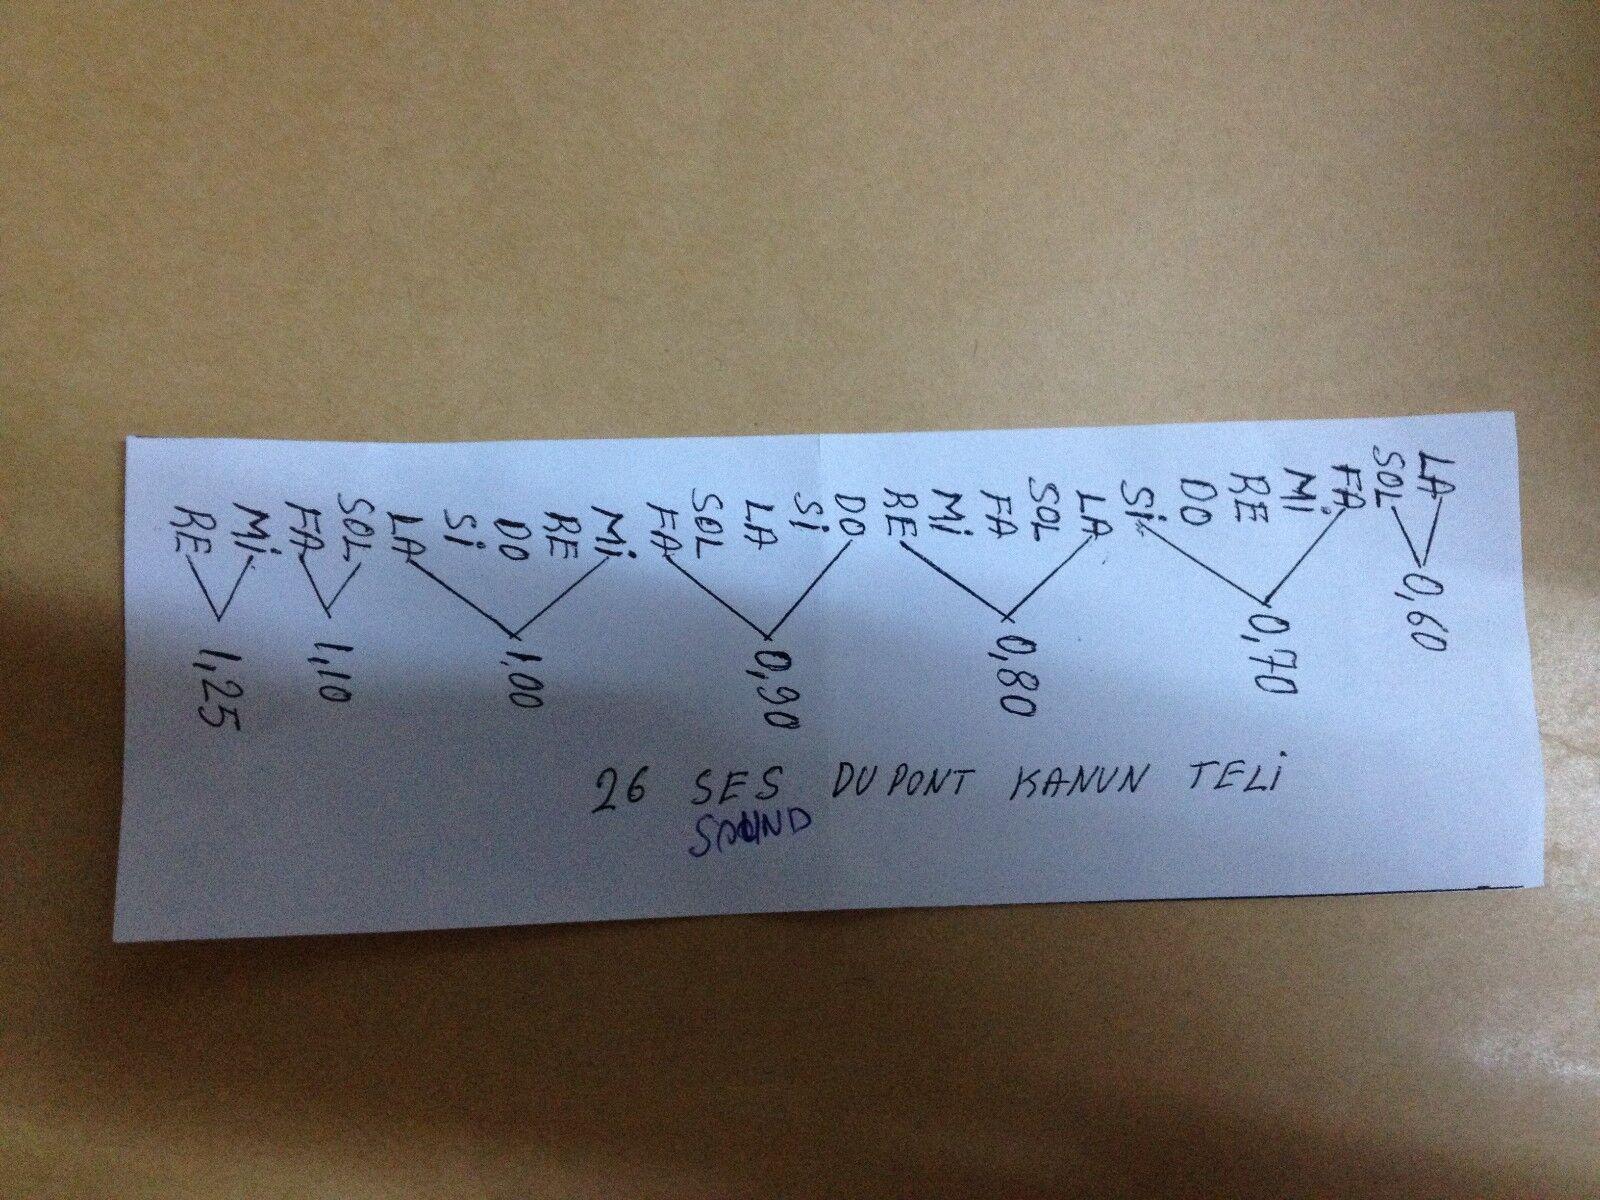 Dupont Juego Cuerda Juego Dupont para Turkish Cuerda Instrumento Kanun Qanun d5a236